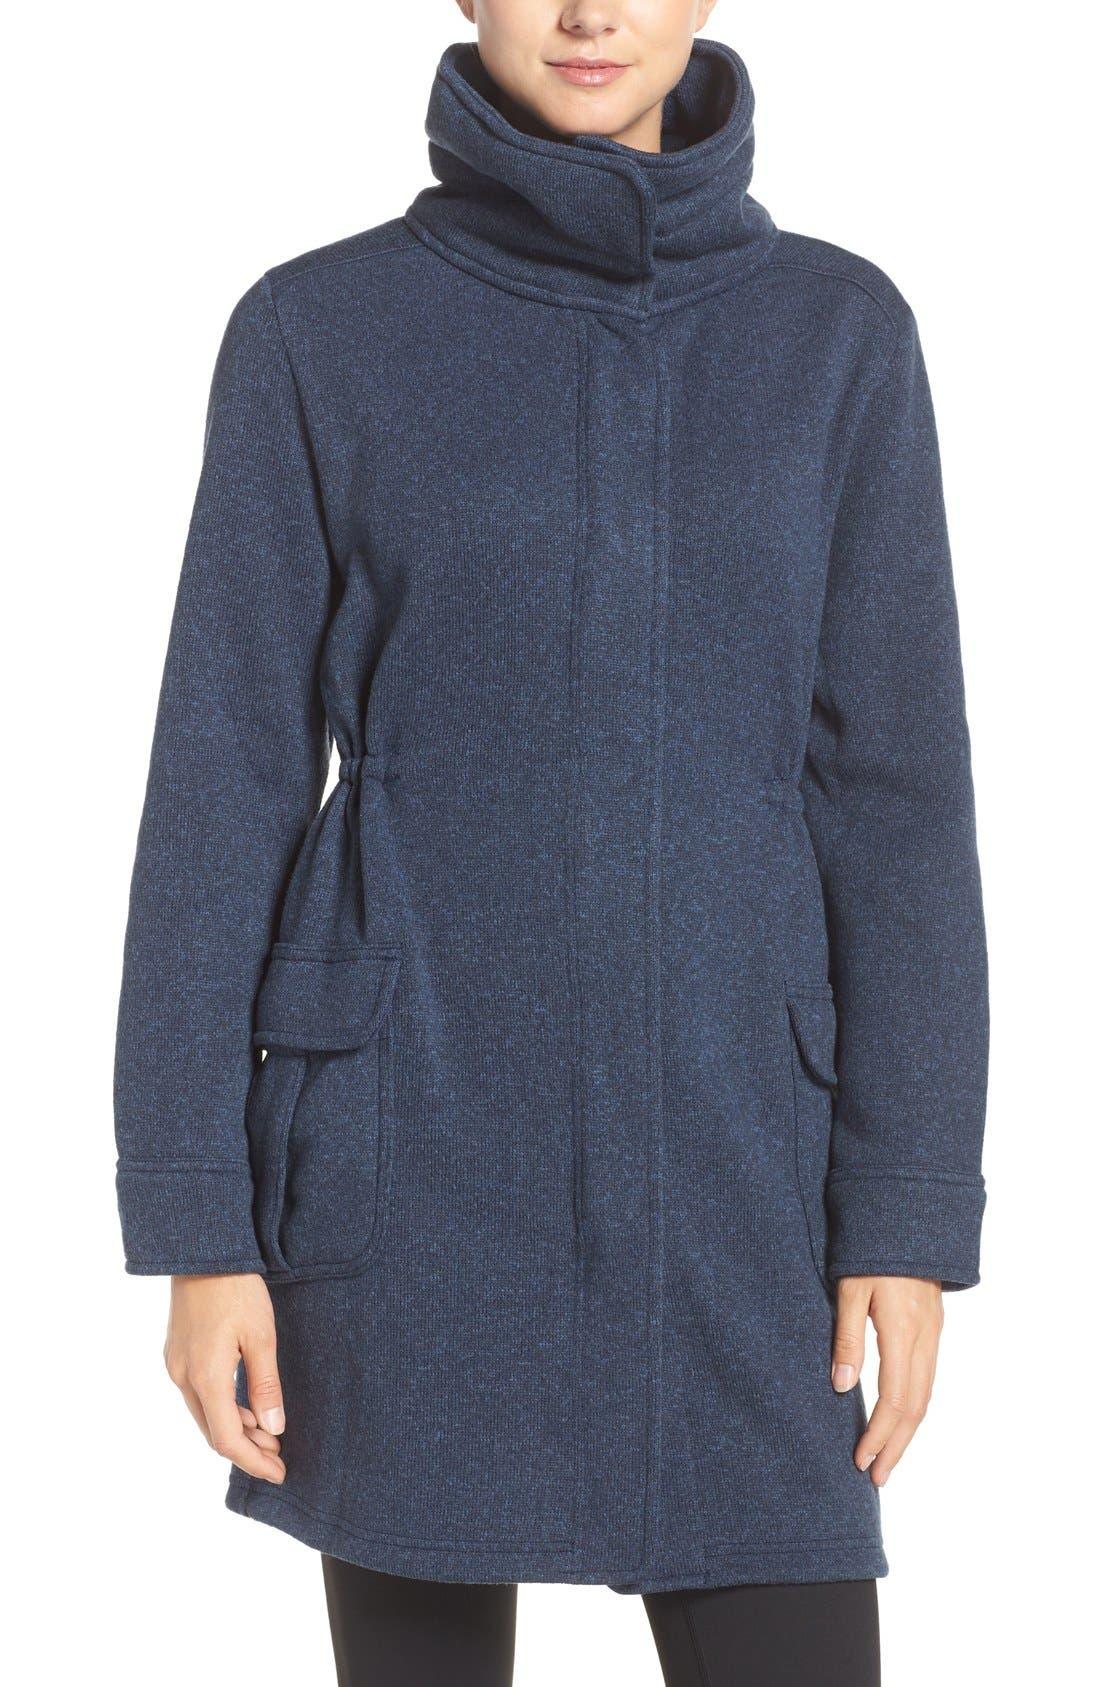 Alternate Image 1 Selected - Patagonia 'Better Sweater®' Fleece Coat